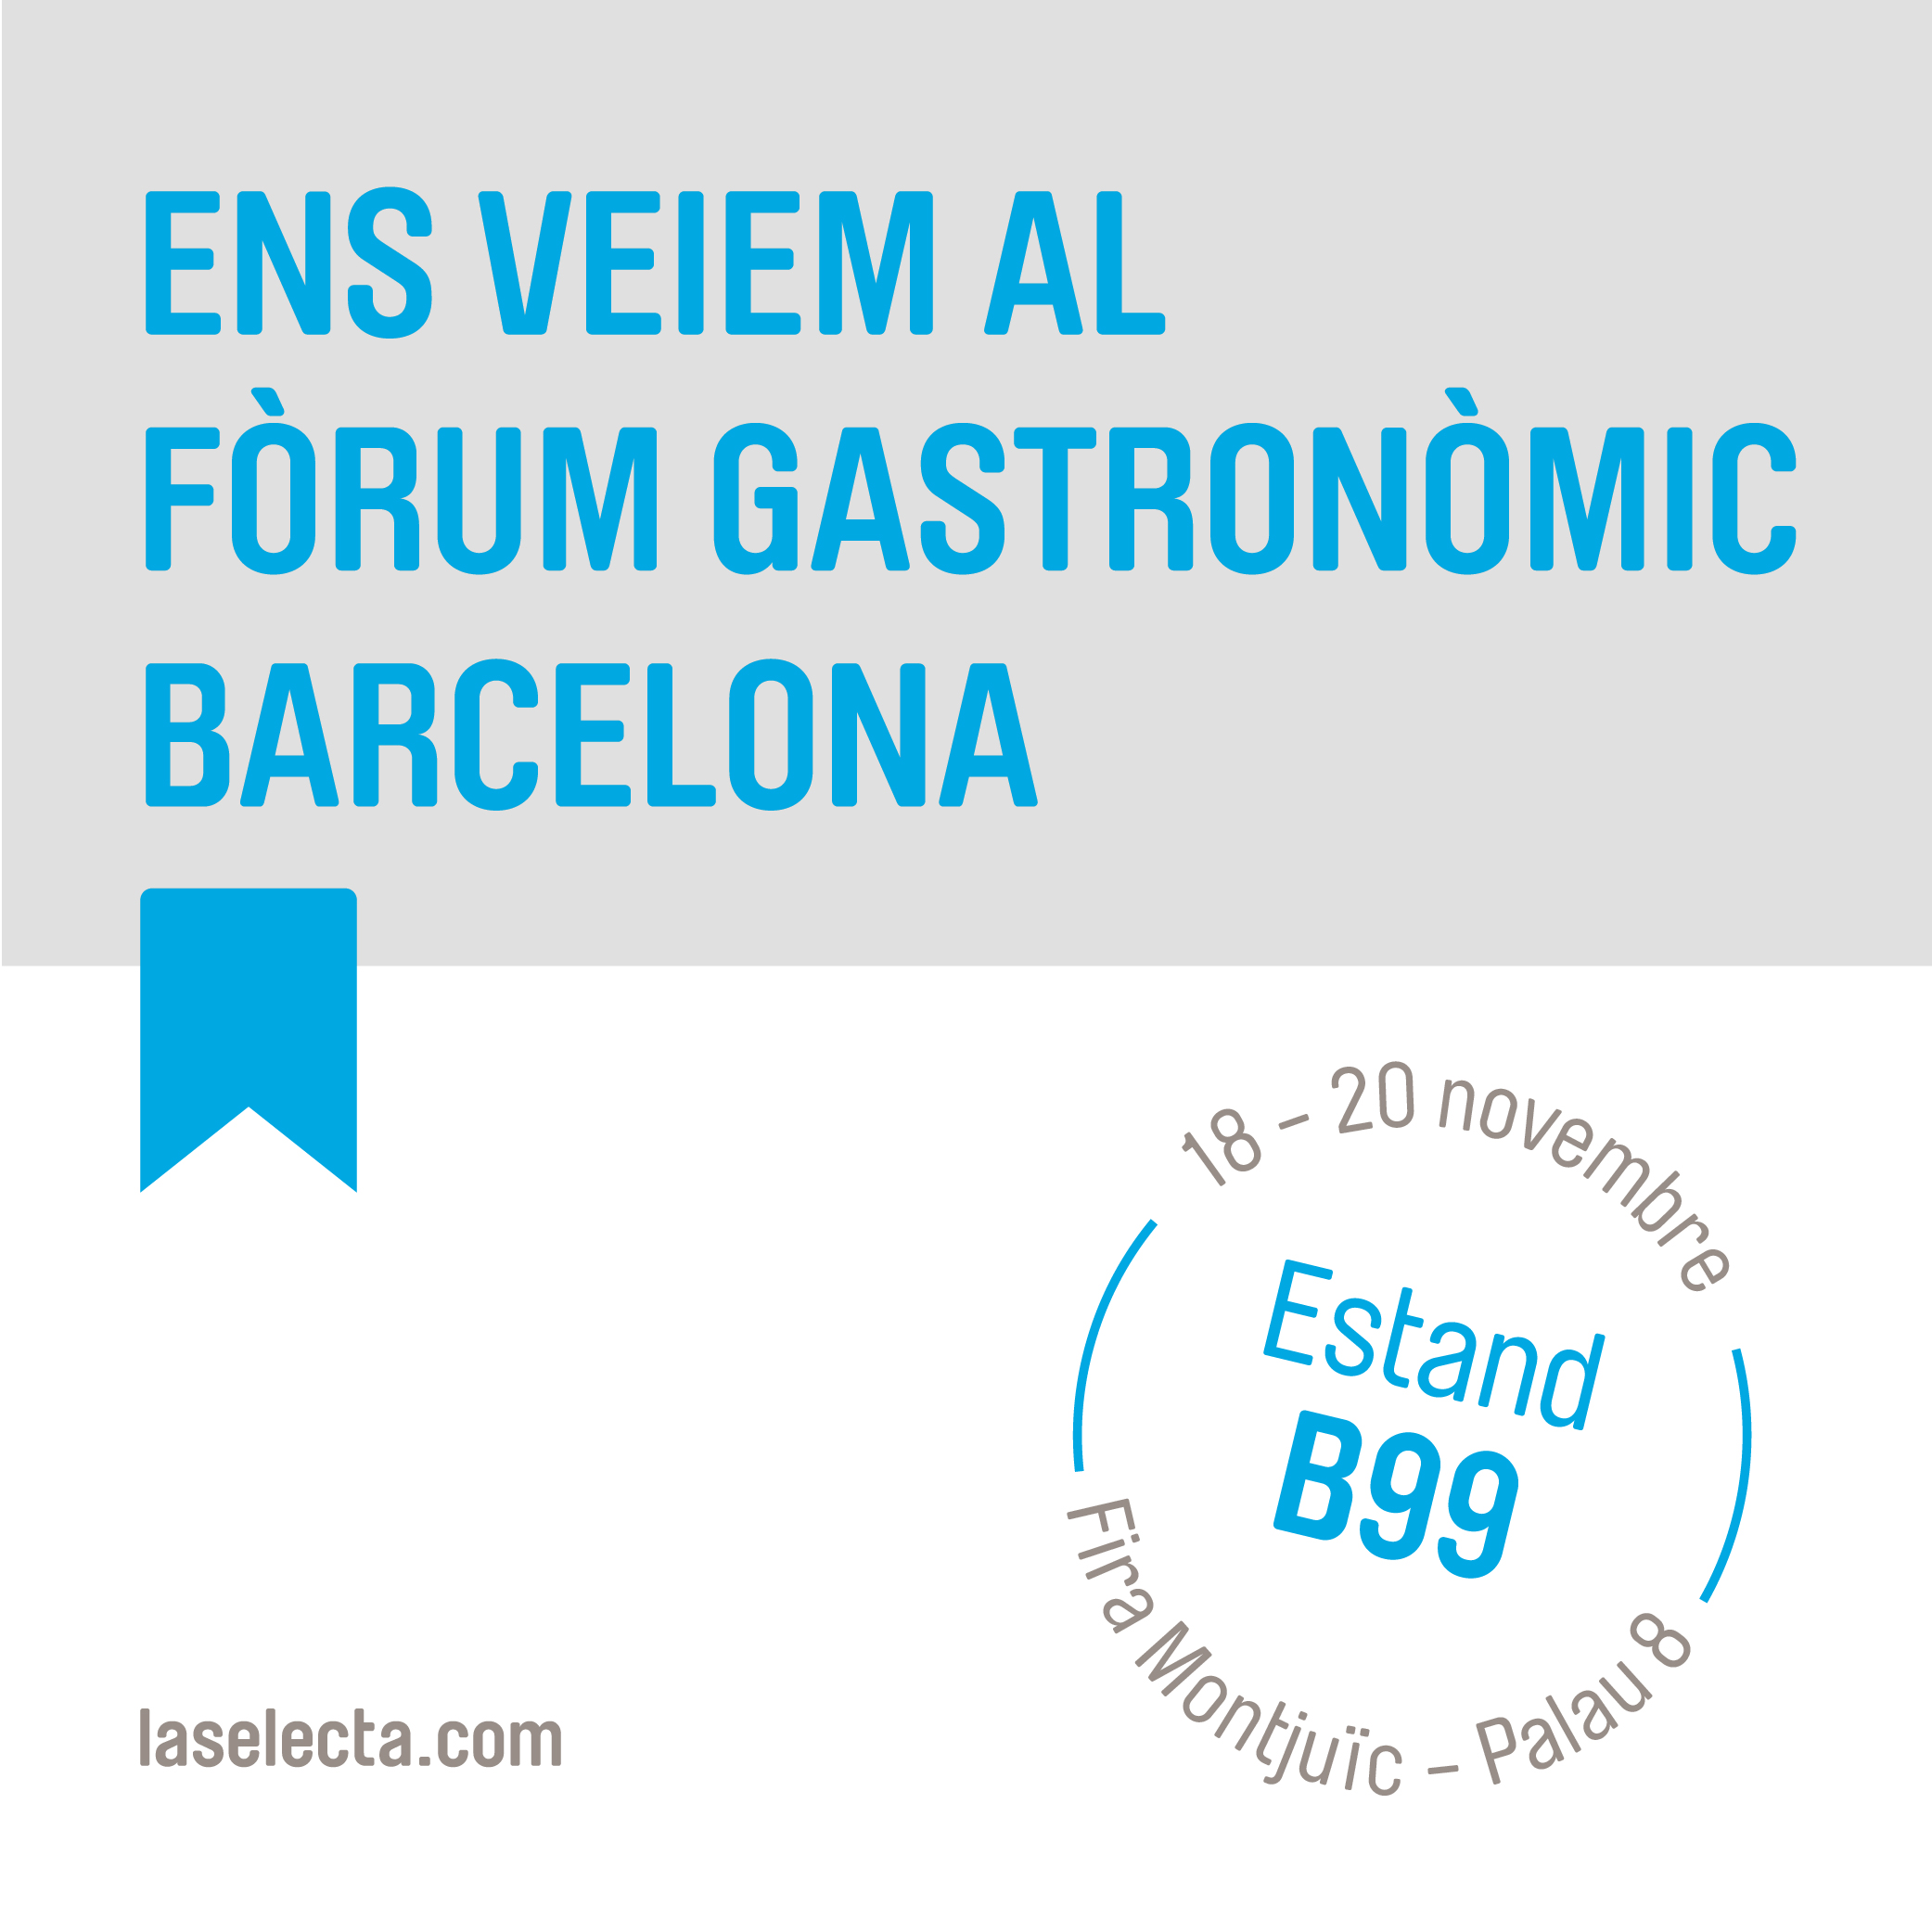 Ens veiem al Fòrum Gastronòmic Barcelona